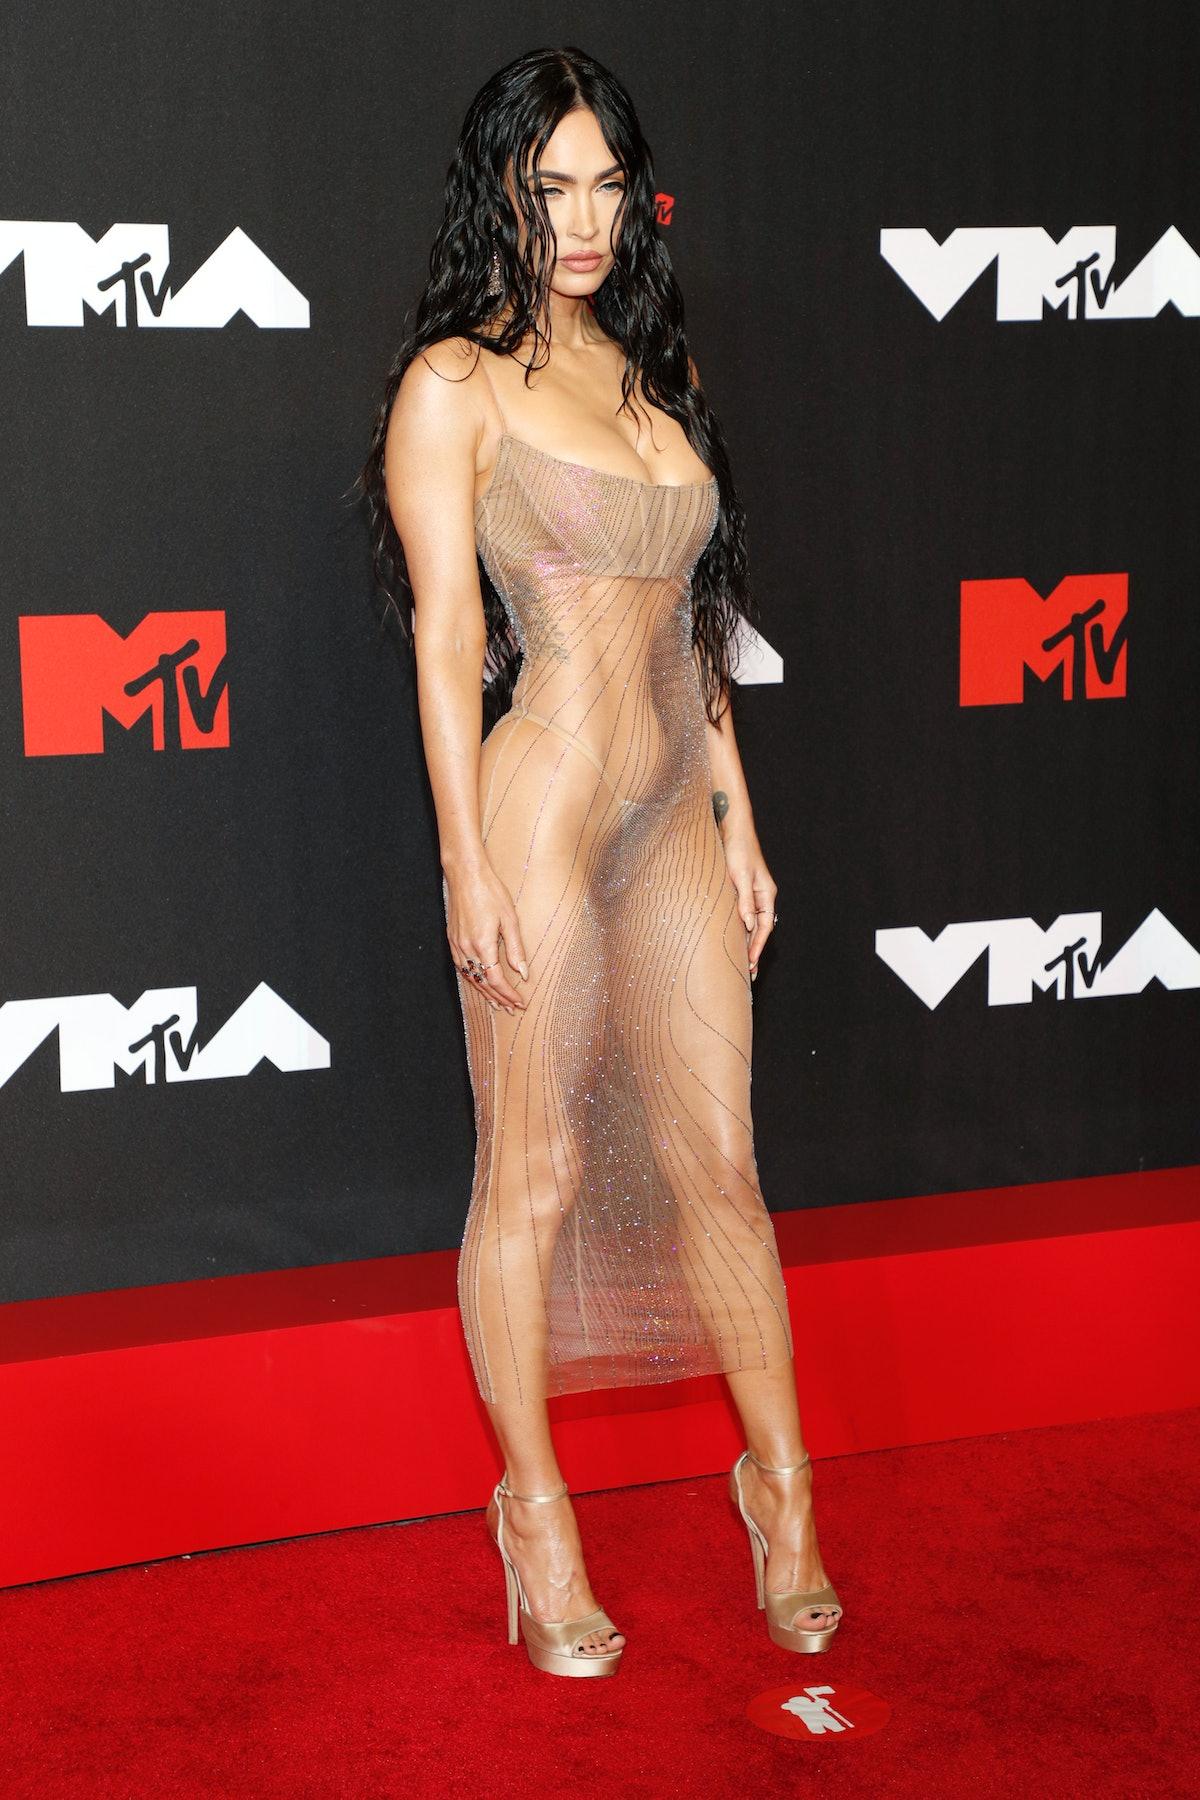 Megan Fox at the 2021 VMAs